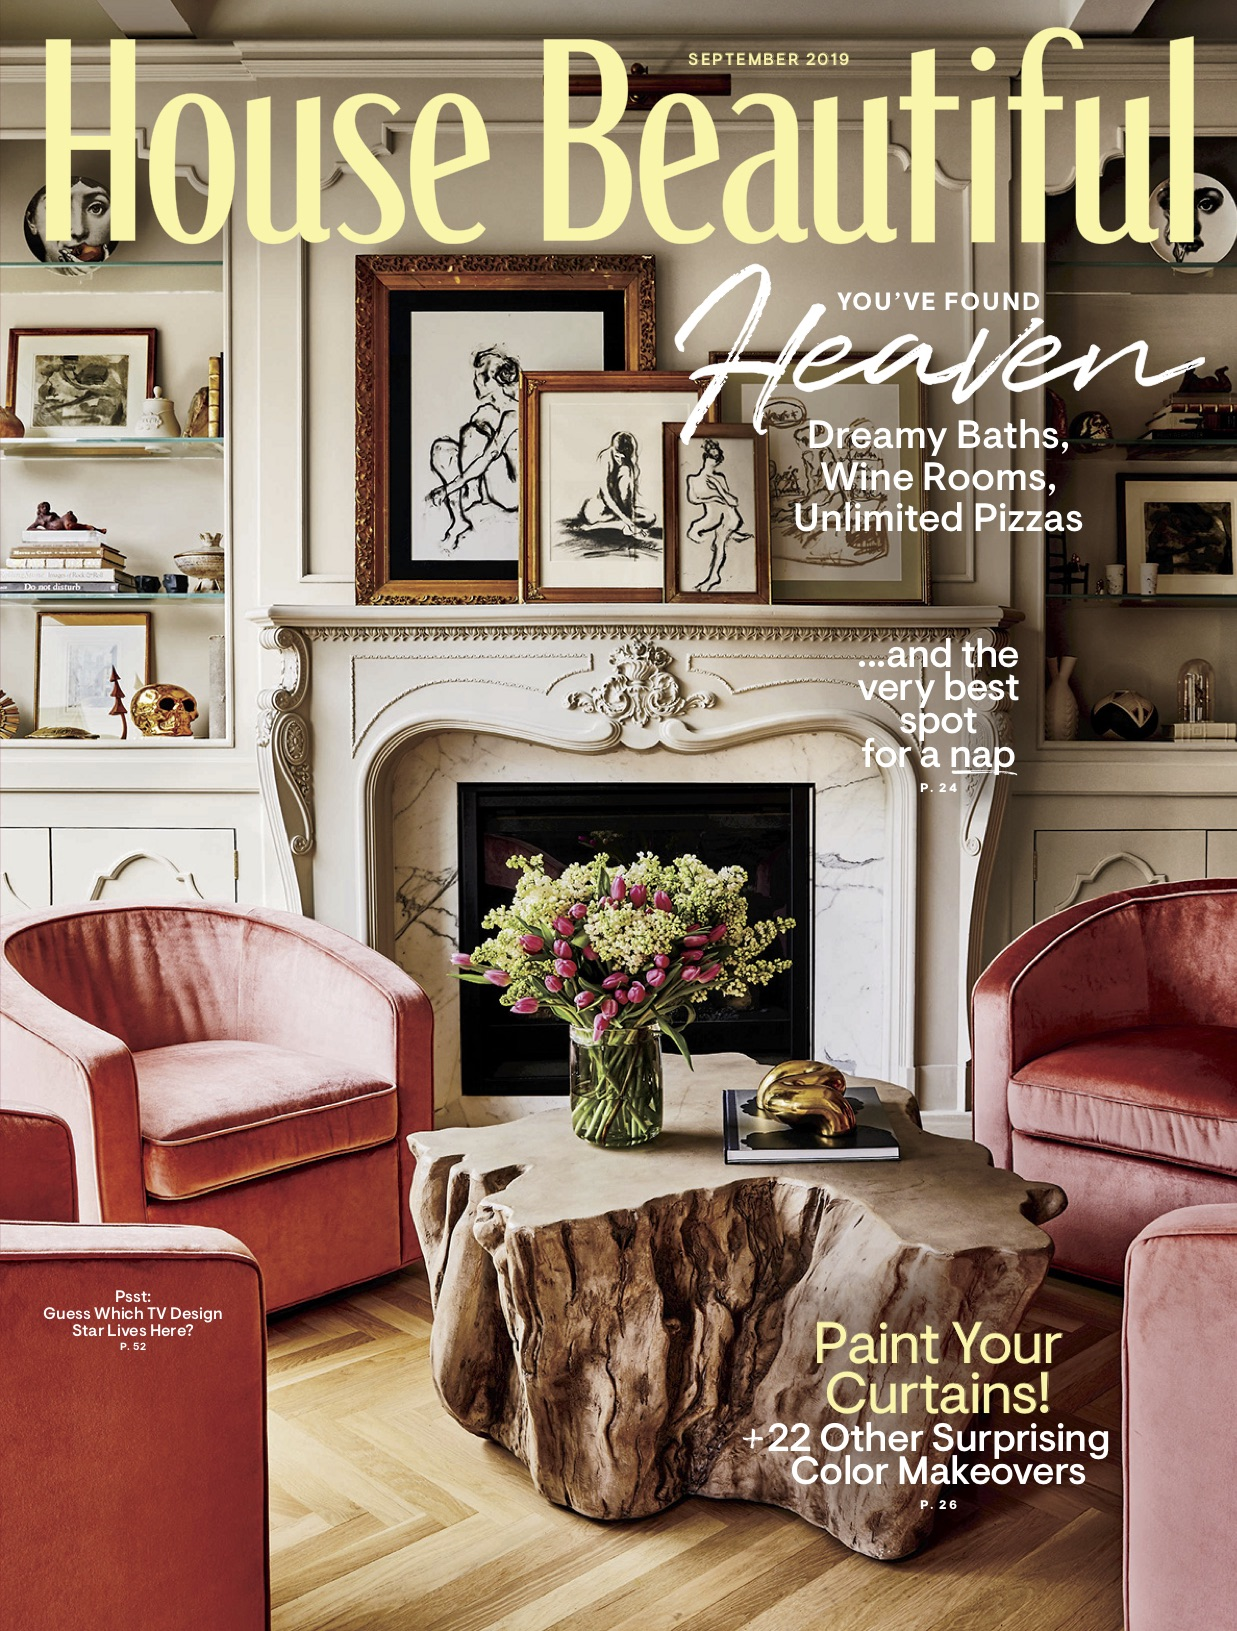 house beautiful magazine SEPTEMBER 2019 issue